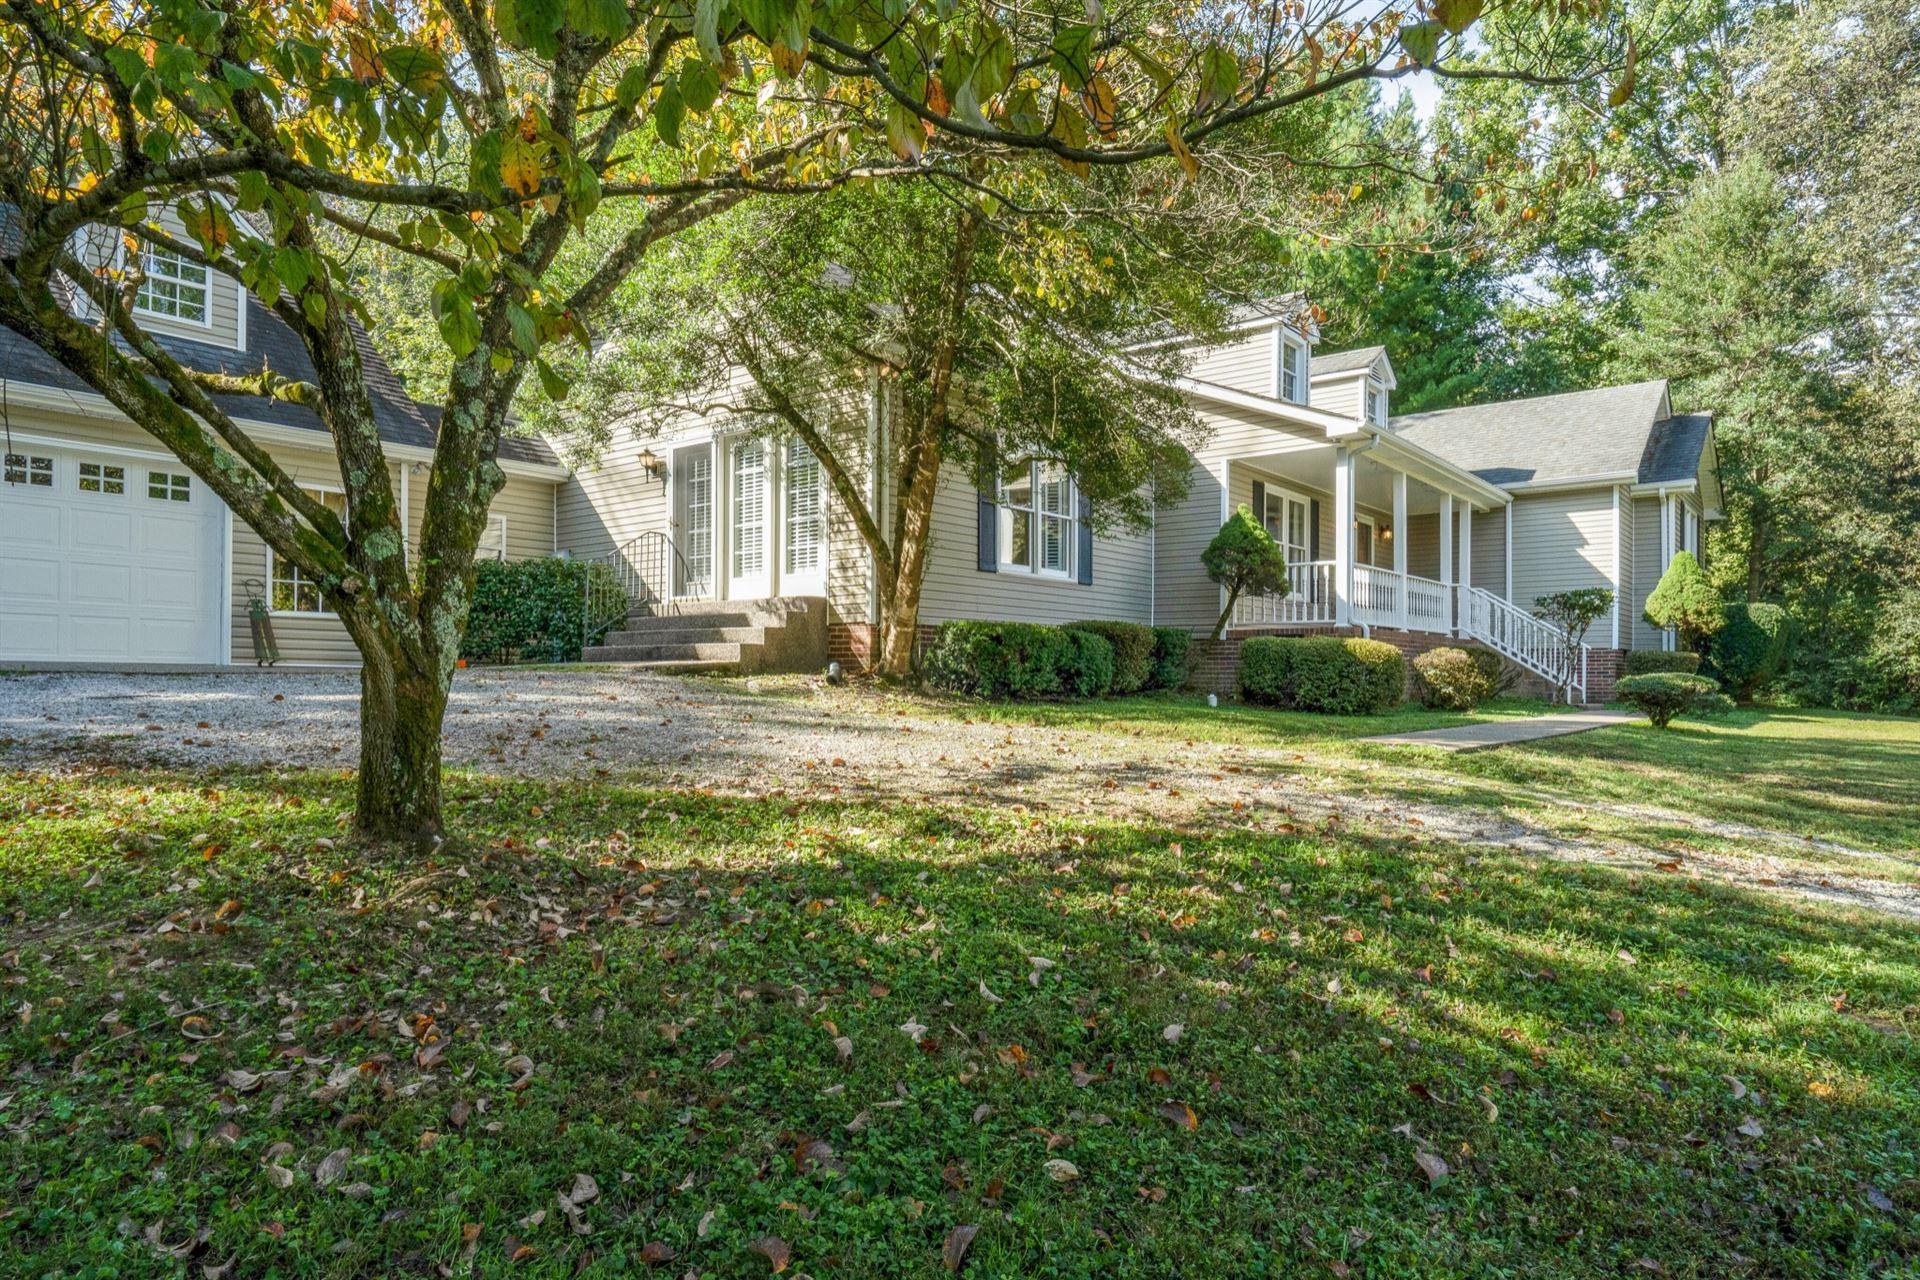 Photo of 4049 Clovercroft Rd, Franklin, TN 37067 (MLS # 2299706)